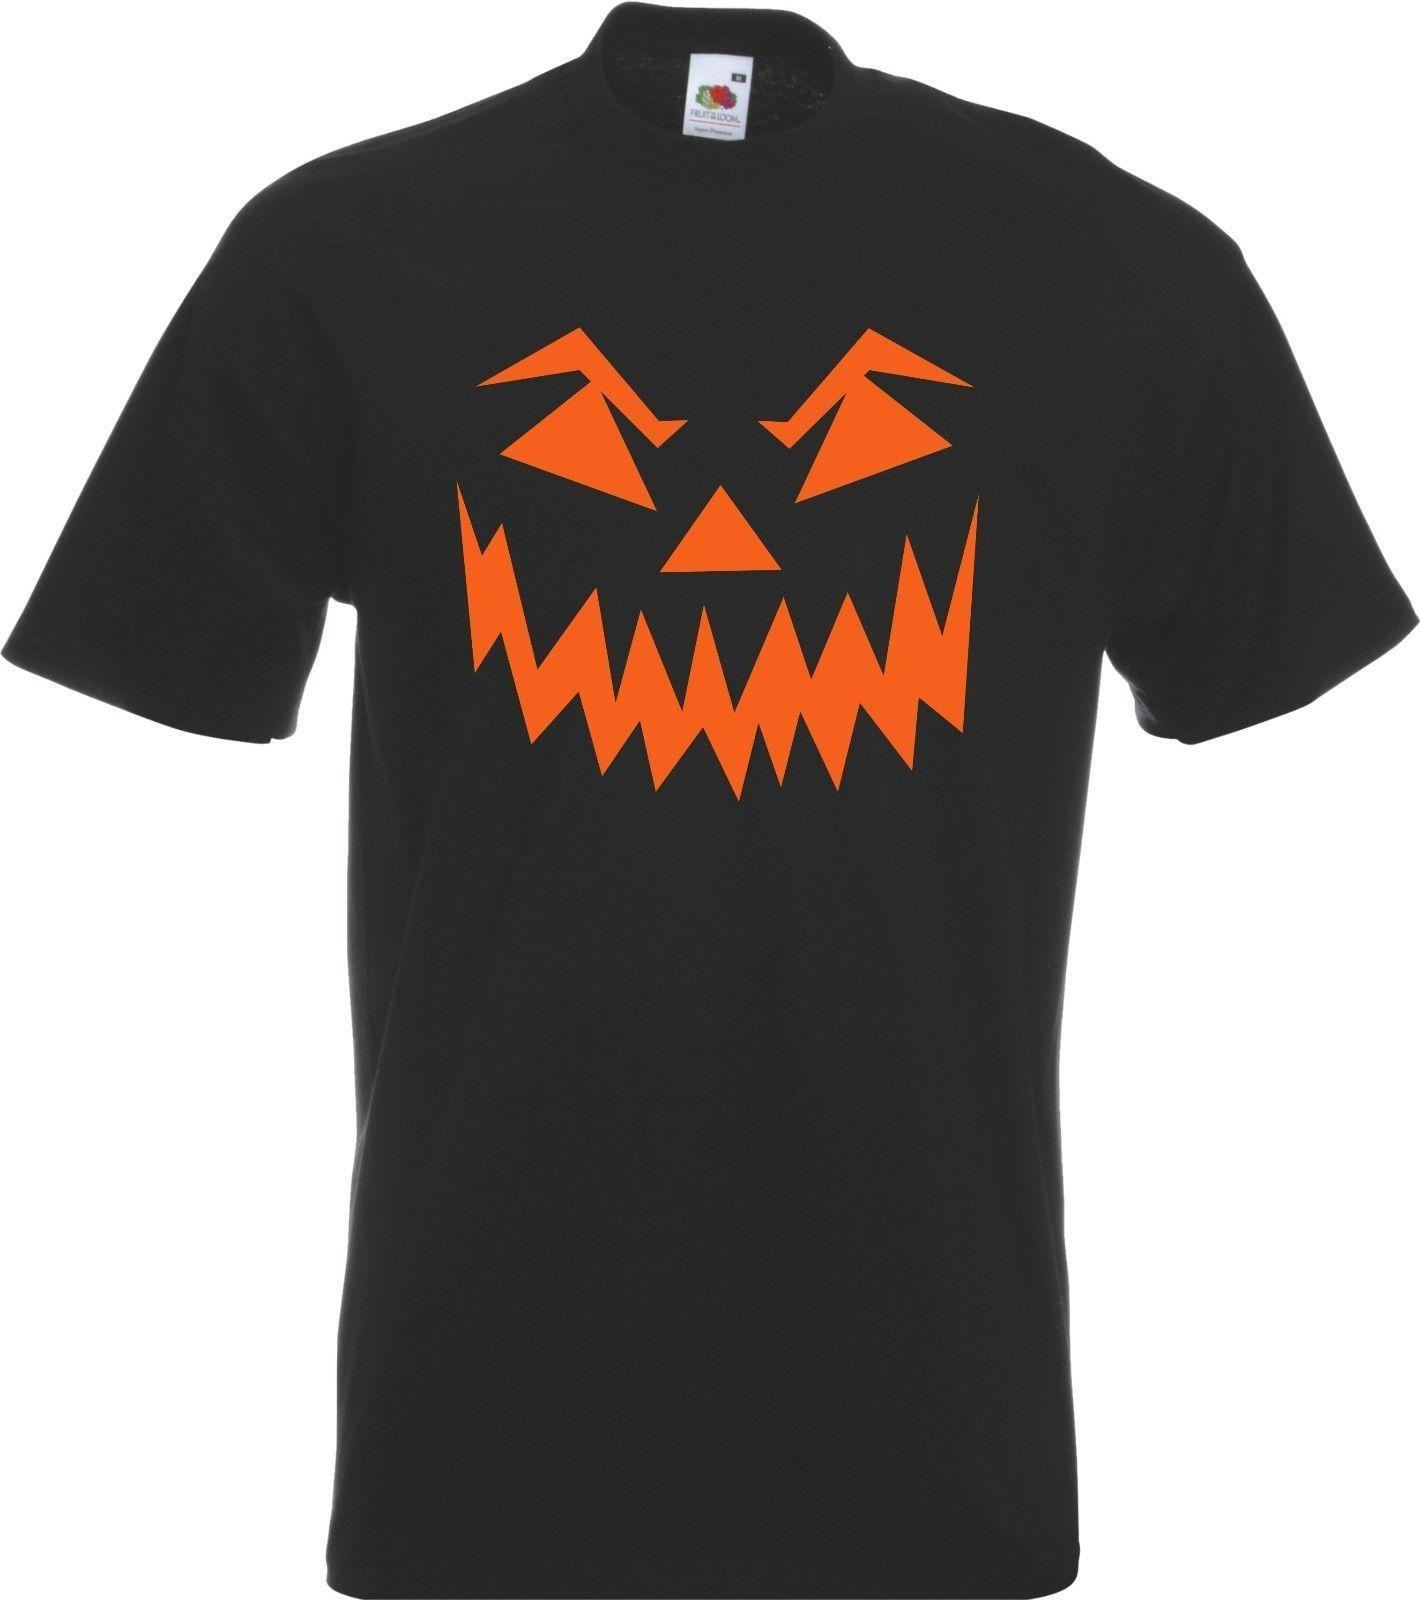 b63cb910de Scary Halloween T Shirt Pumpkin Eyes Horror Fancy Dress Costume Mens Cotton T  Shirt Round Neck Man'S O Neck Fashion Printed Best Tee Shirts T Shirts Cheap  ...